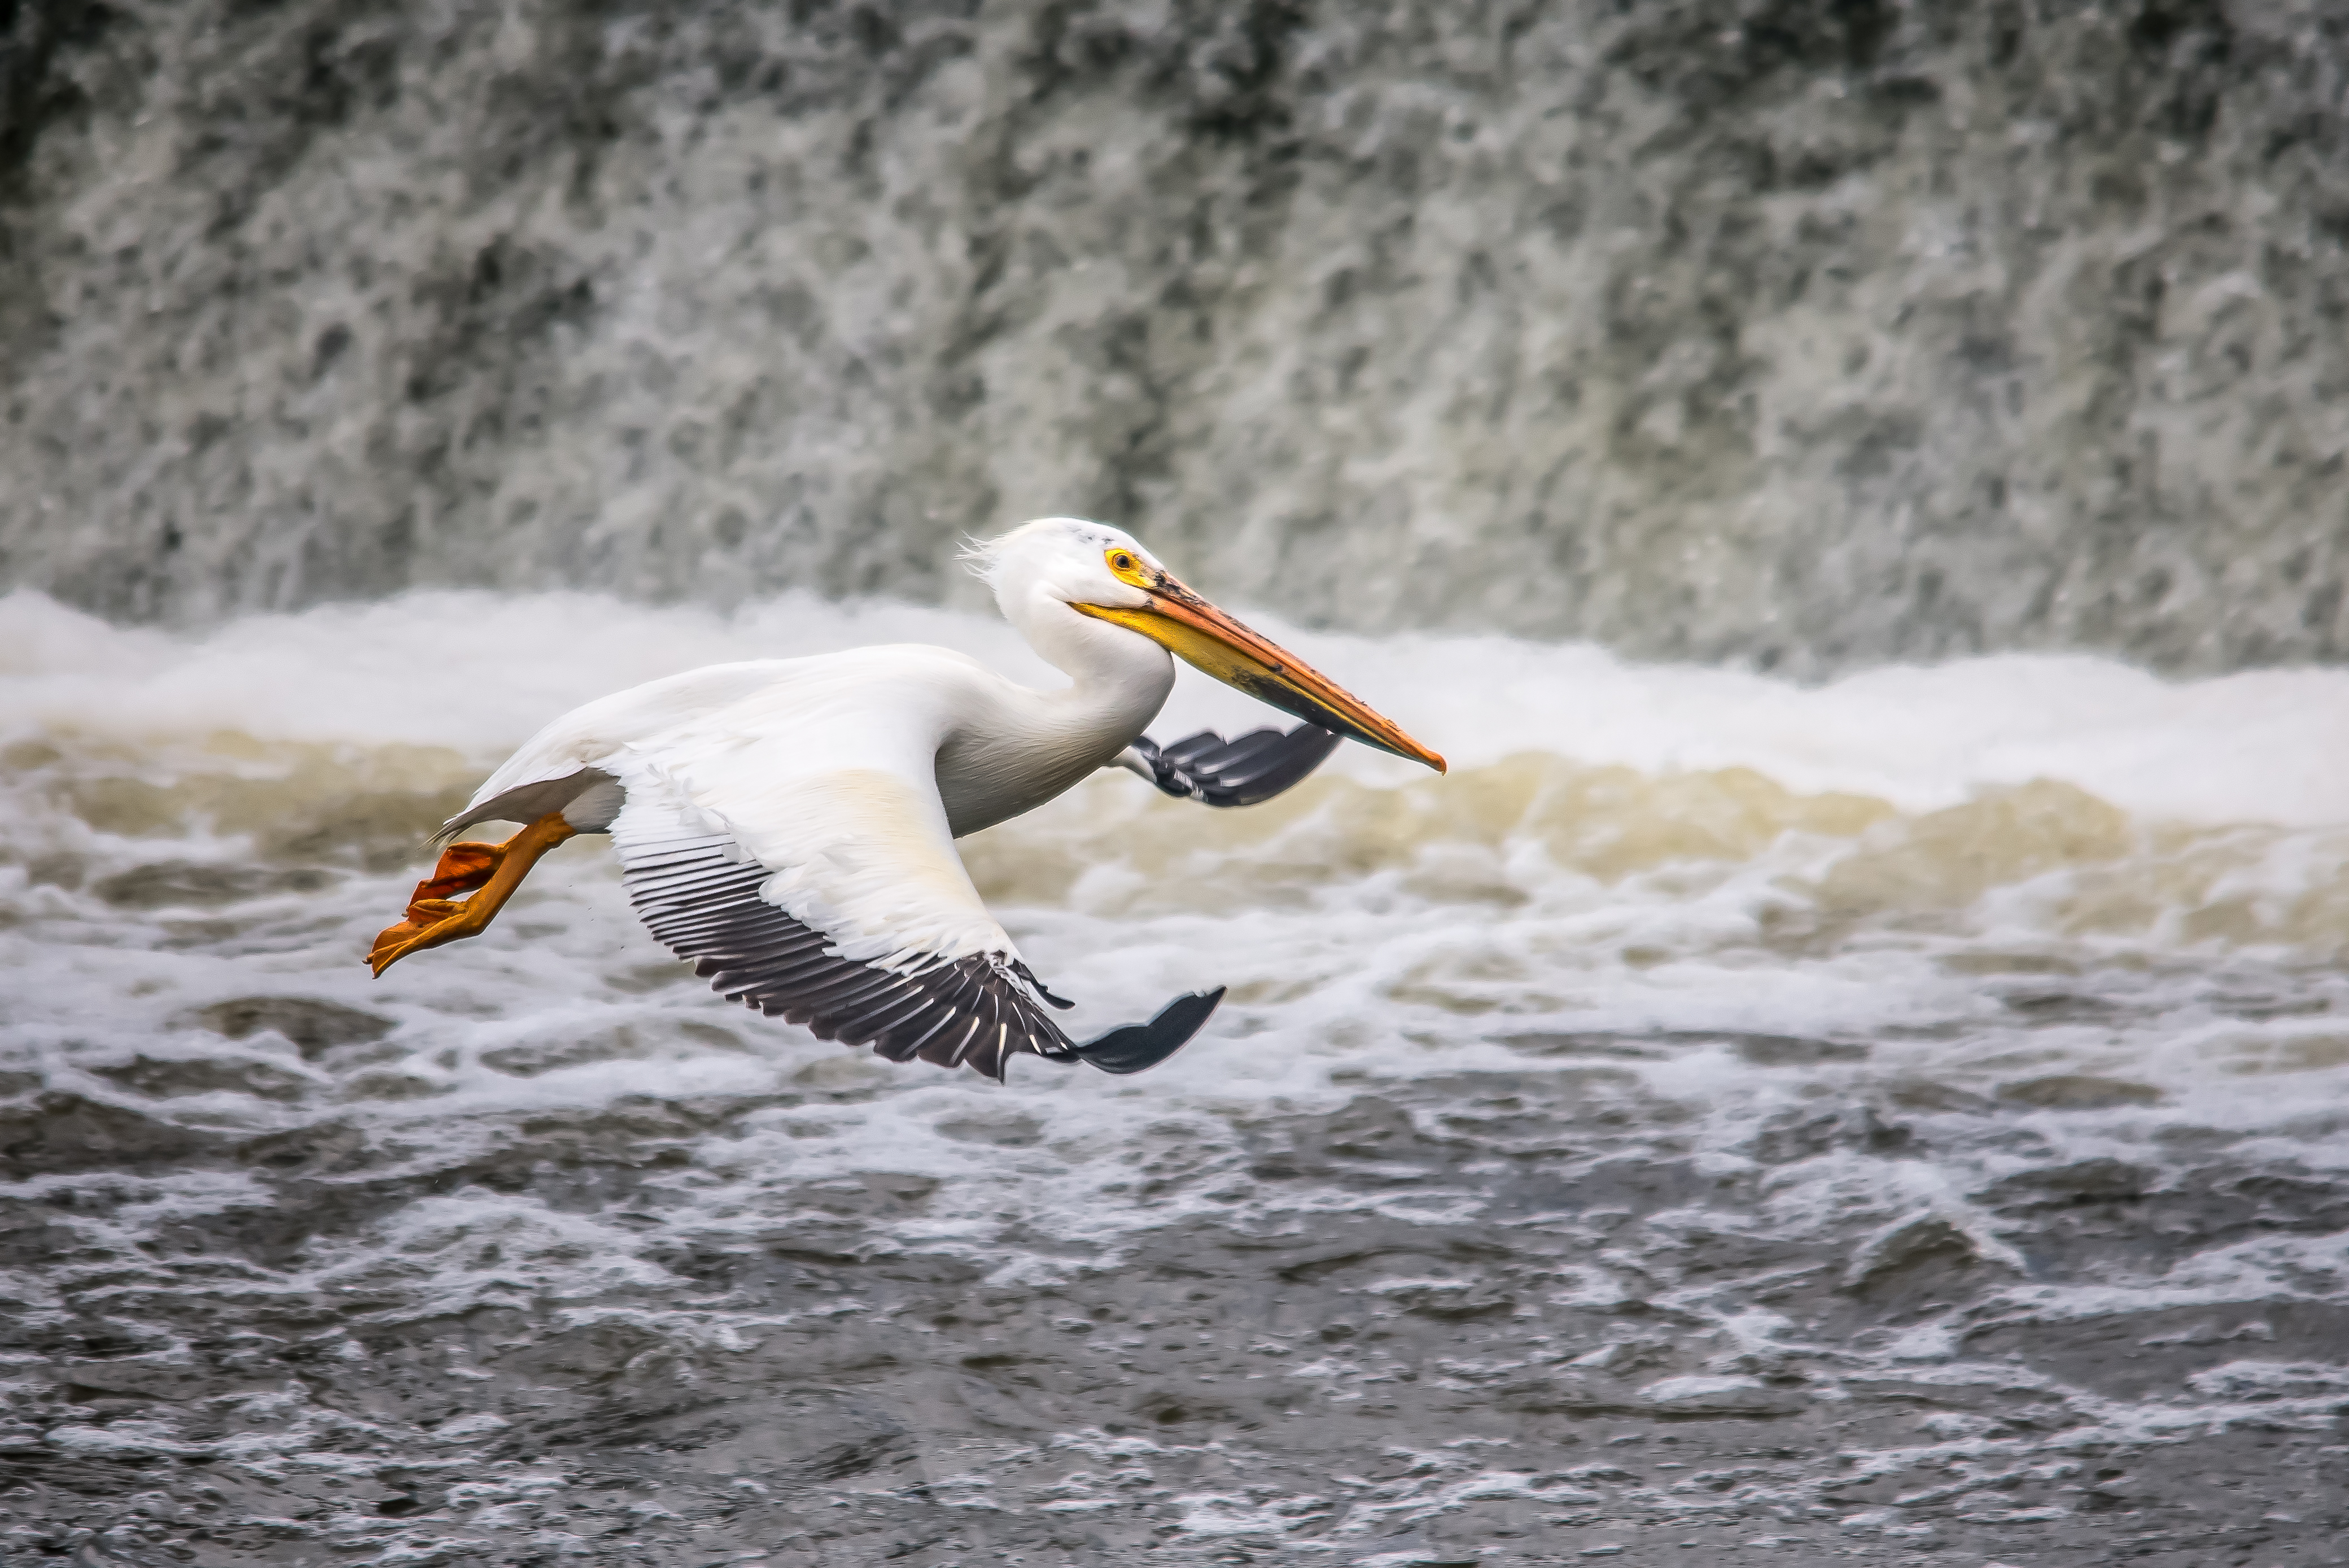 Pelican Landing in River by Kyle Mortara